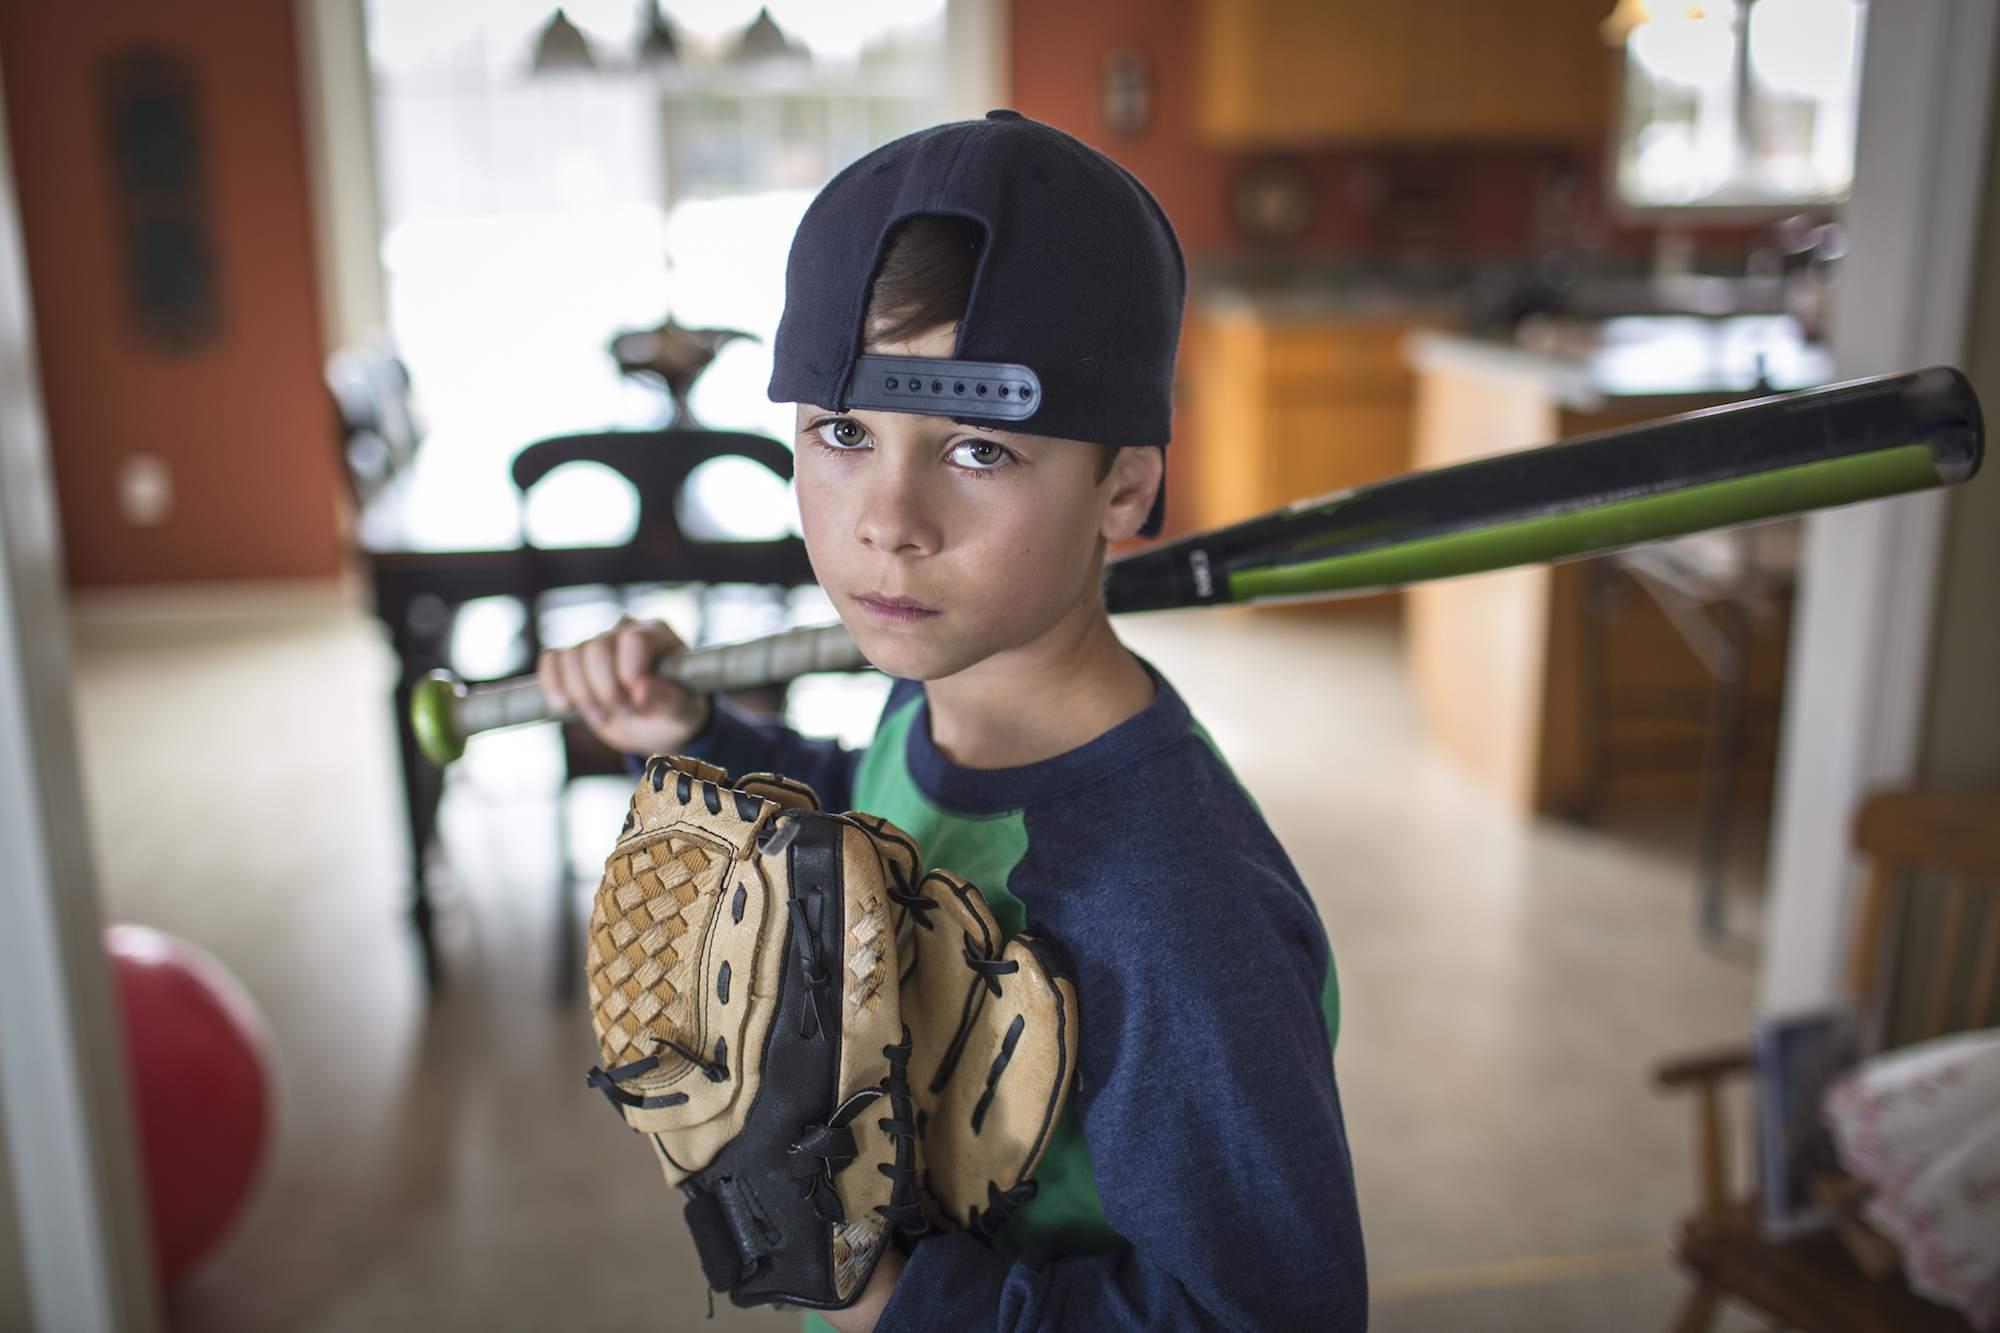 Portrait of boy baseball player with attitude